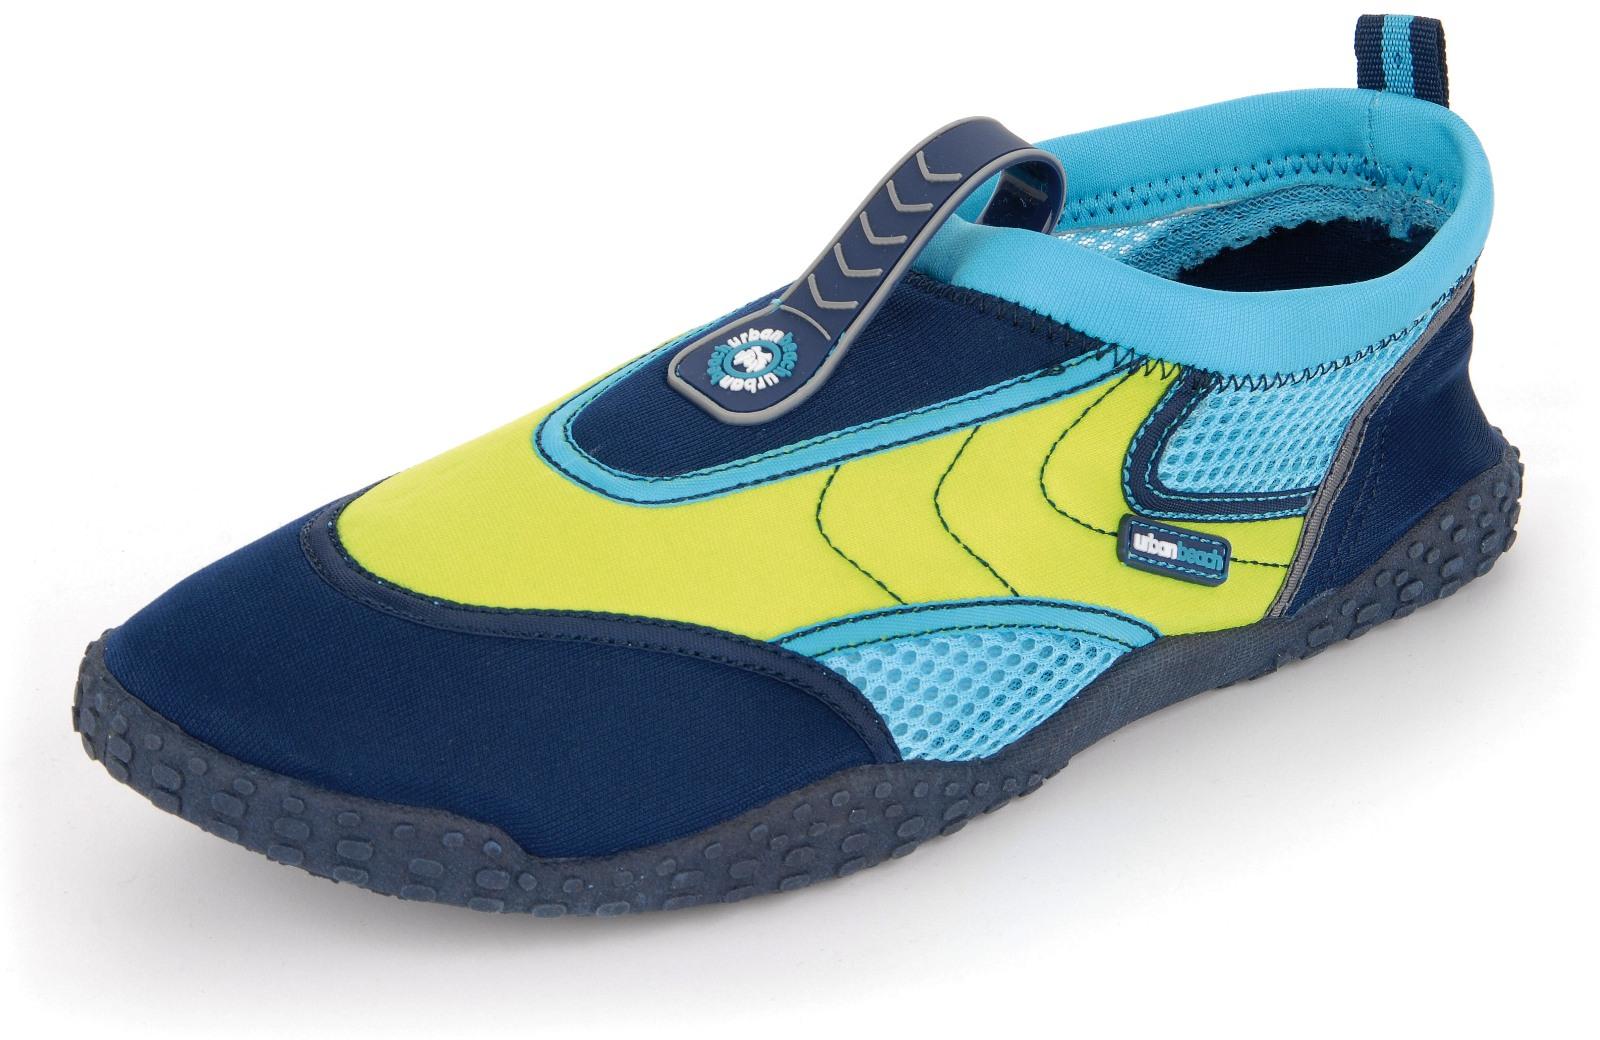 918b4b7da7b2 Boys Kids Aqua Socks Beach Water Shoes Wetsuit Swim Surf Protection ...